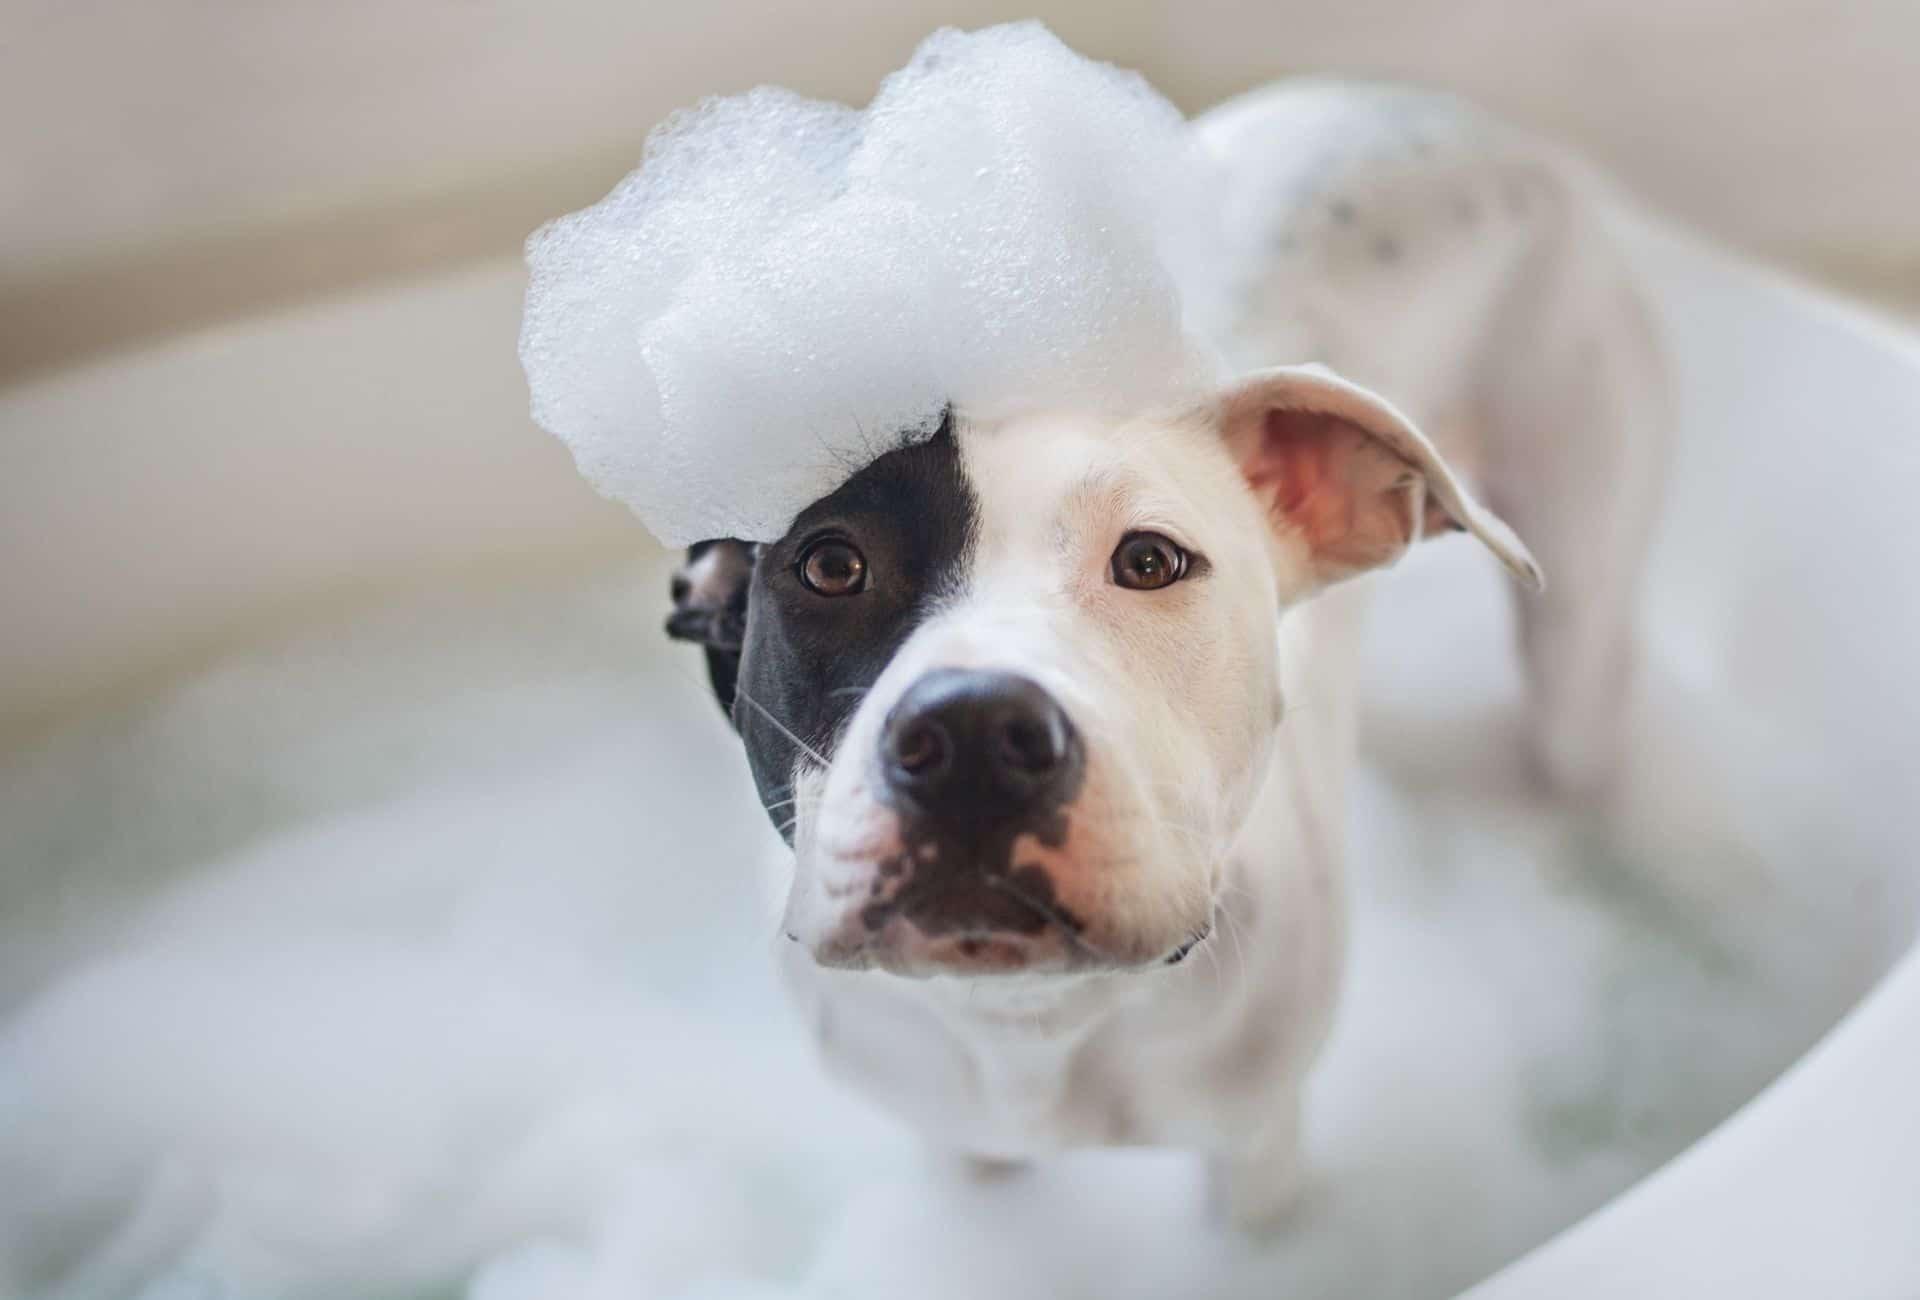 Pitbull taking a bath.